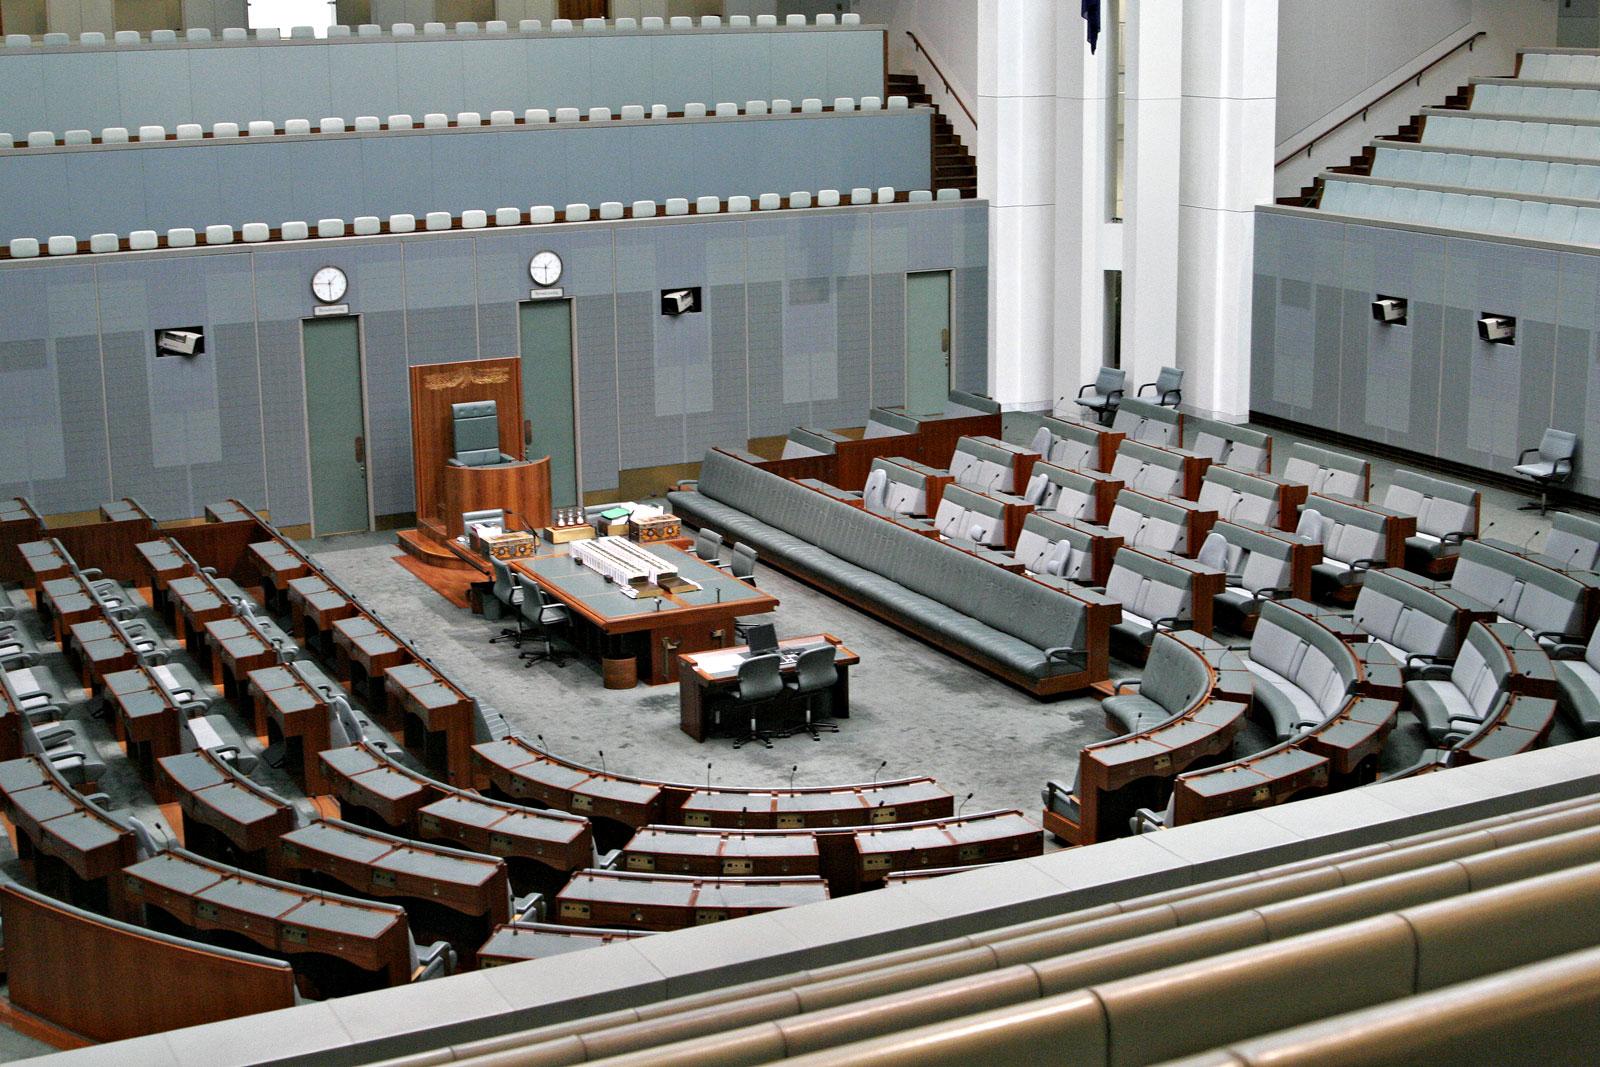 http://upload.wikimedia.org/wikipedia/commons/2/20/Australian_house_of_representatives.jpg